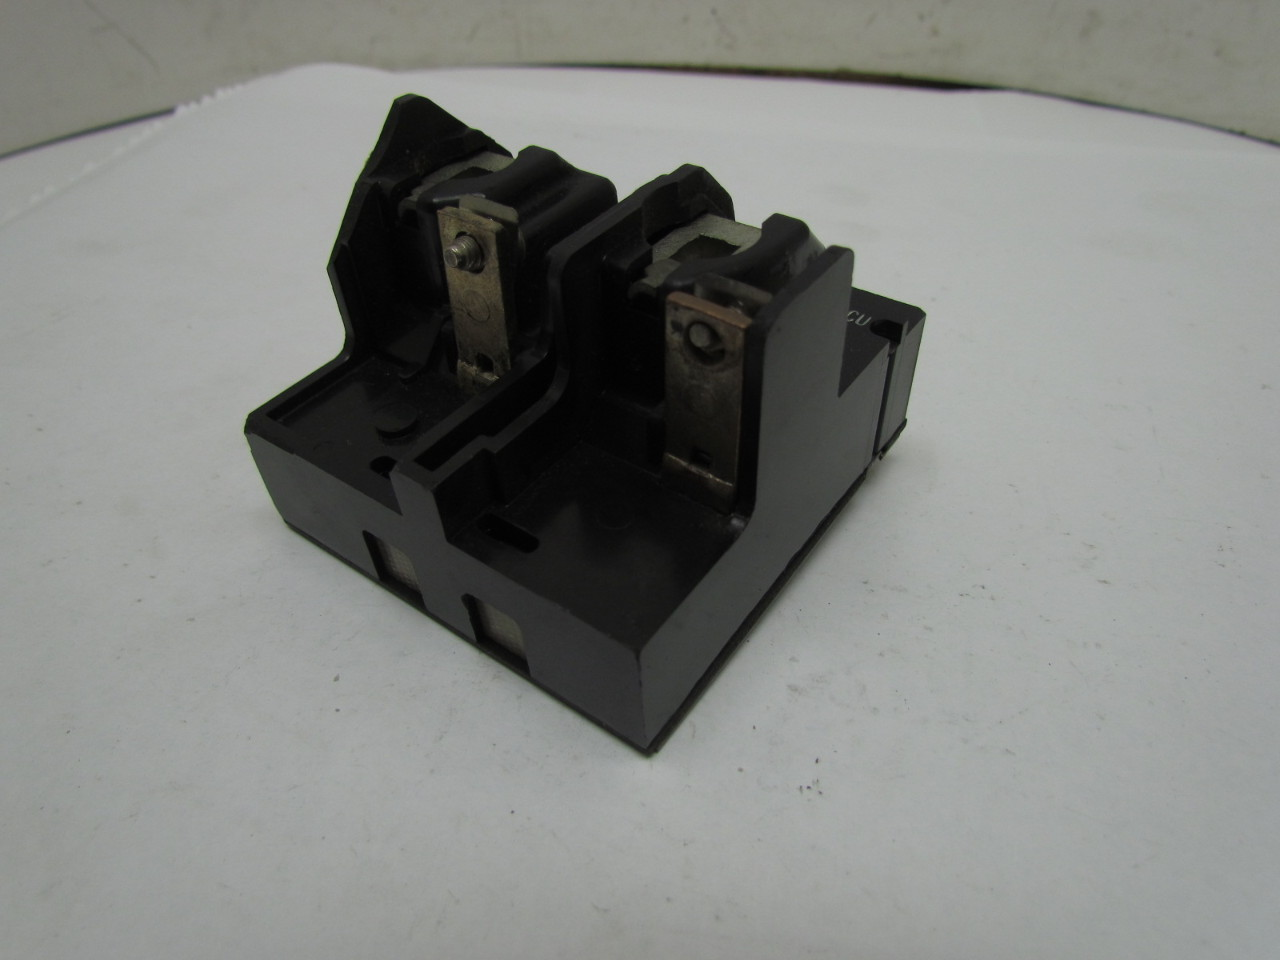 220v gfci breaker wiring diagram ite 10kaic 2-pole pushmatic circuit breaker 40 amp   ebay #15